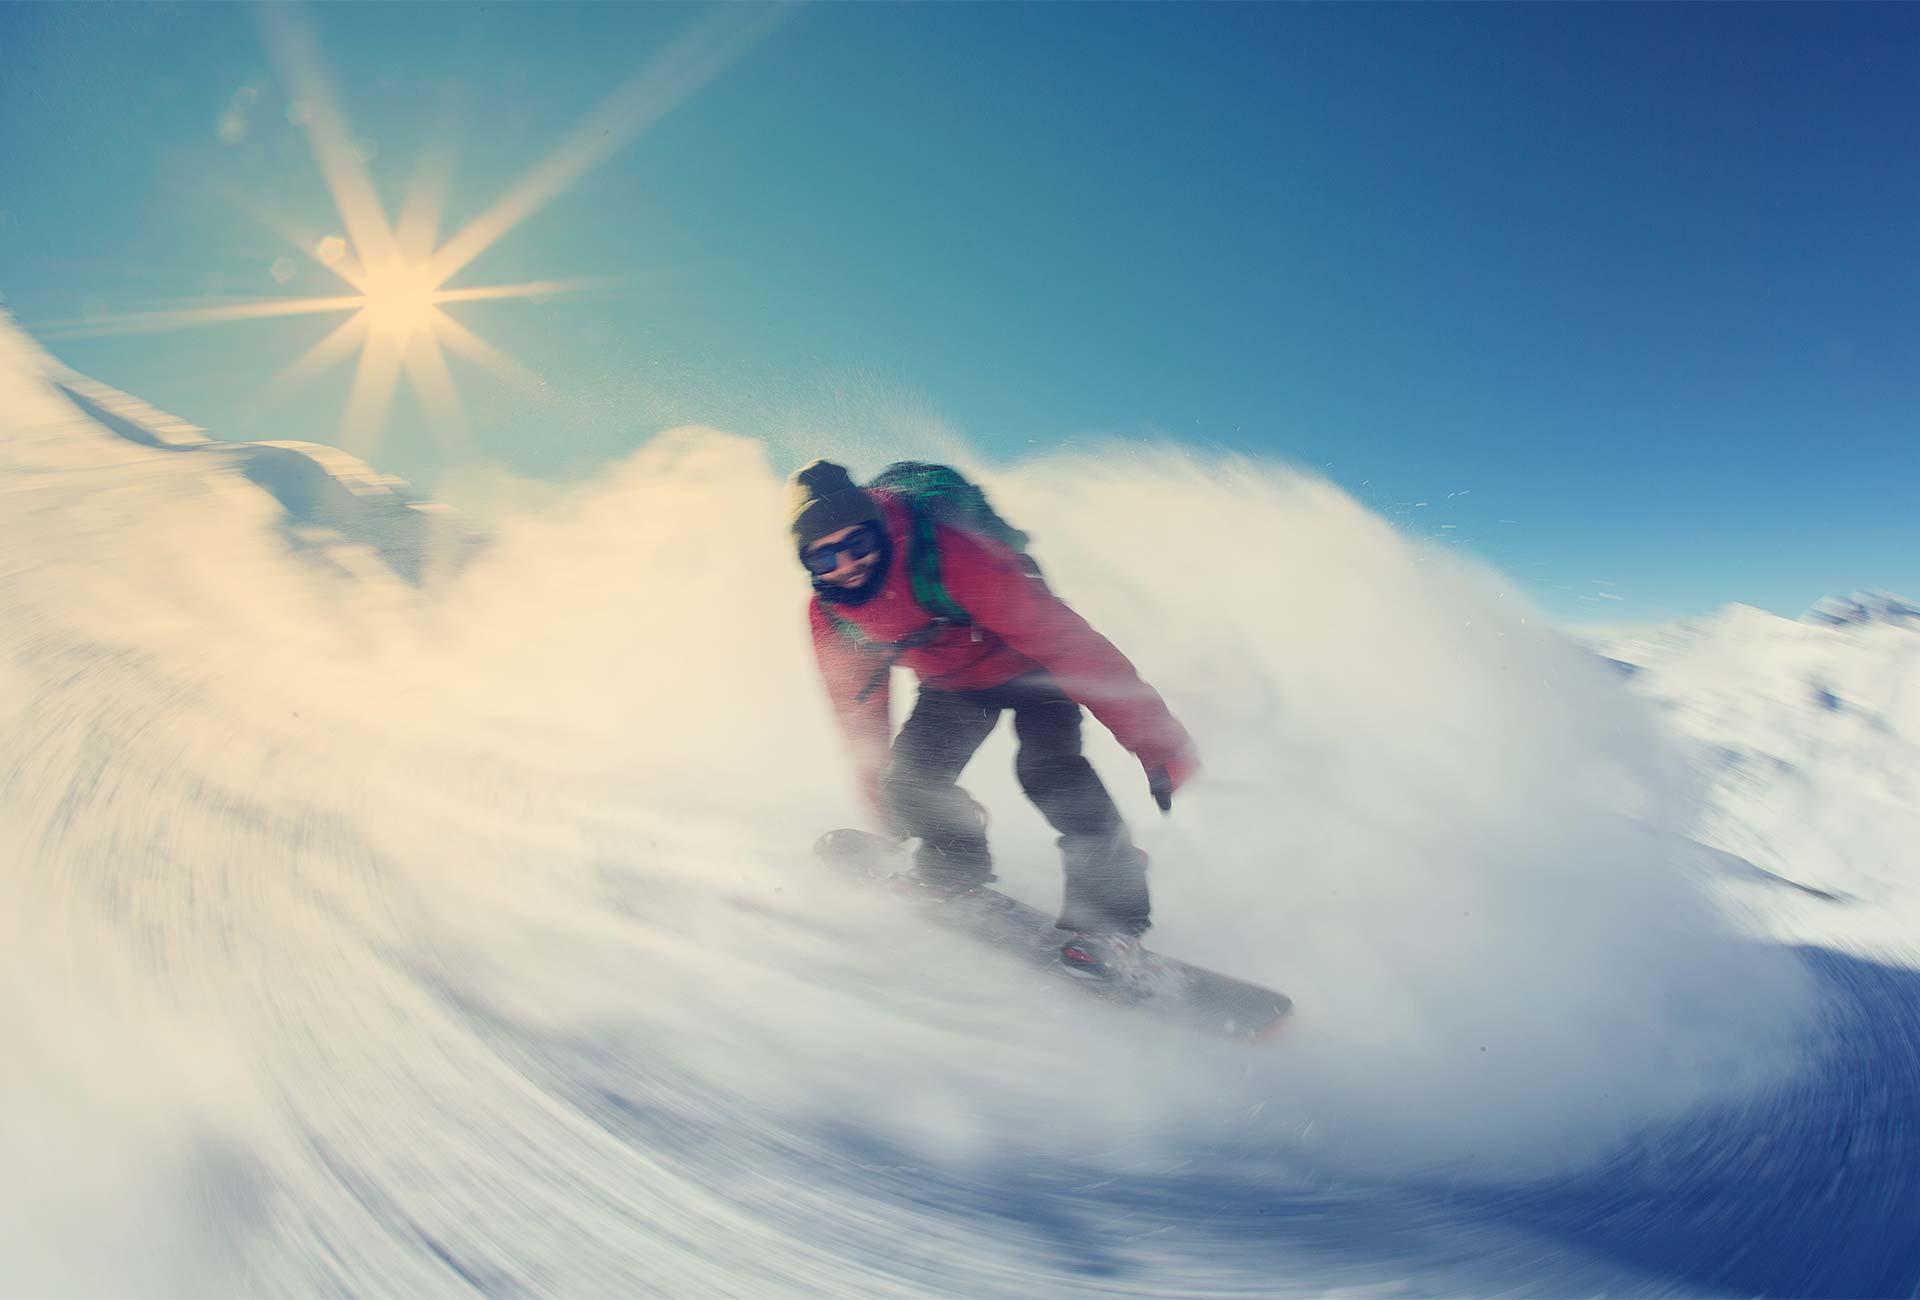 ski_snowboard_slider_12